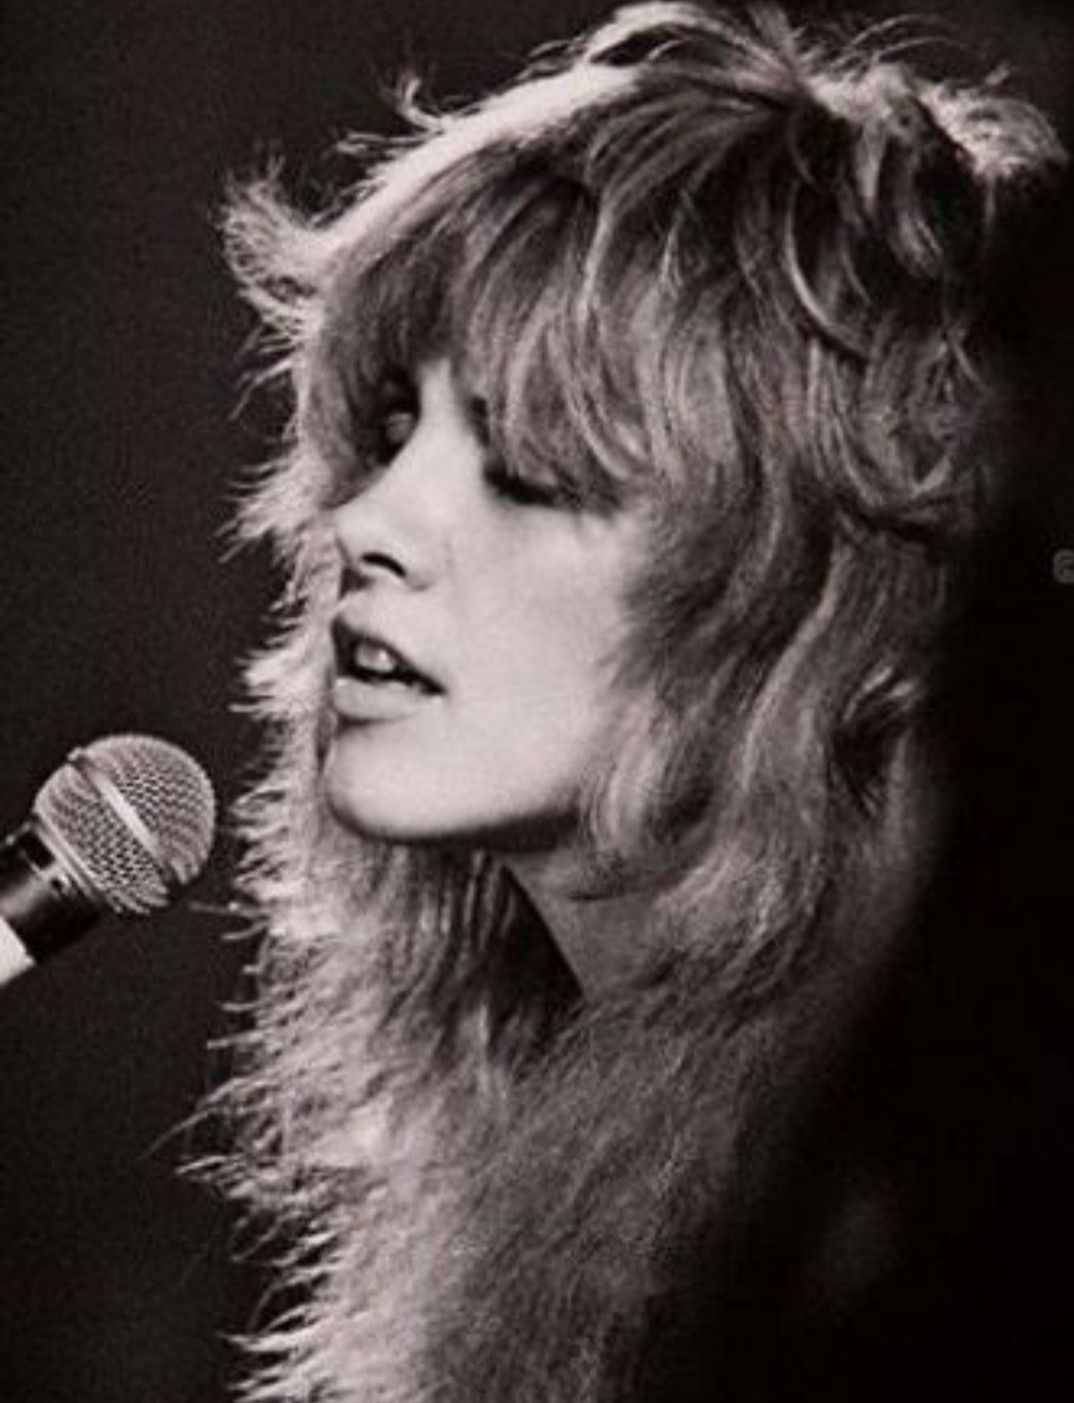 I Love This Photo 70 S Stevie Stevie Nicks Fleetwood Mac Stevie Nicks Stevie Nicks Style